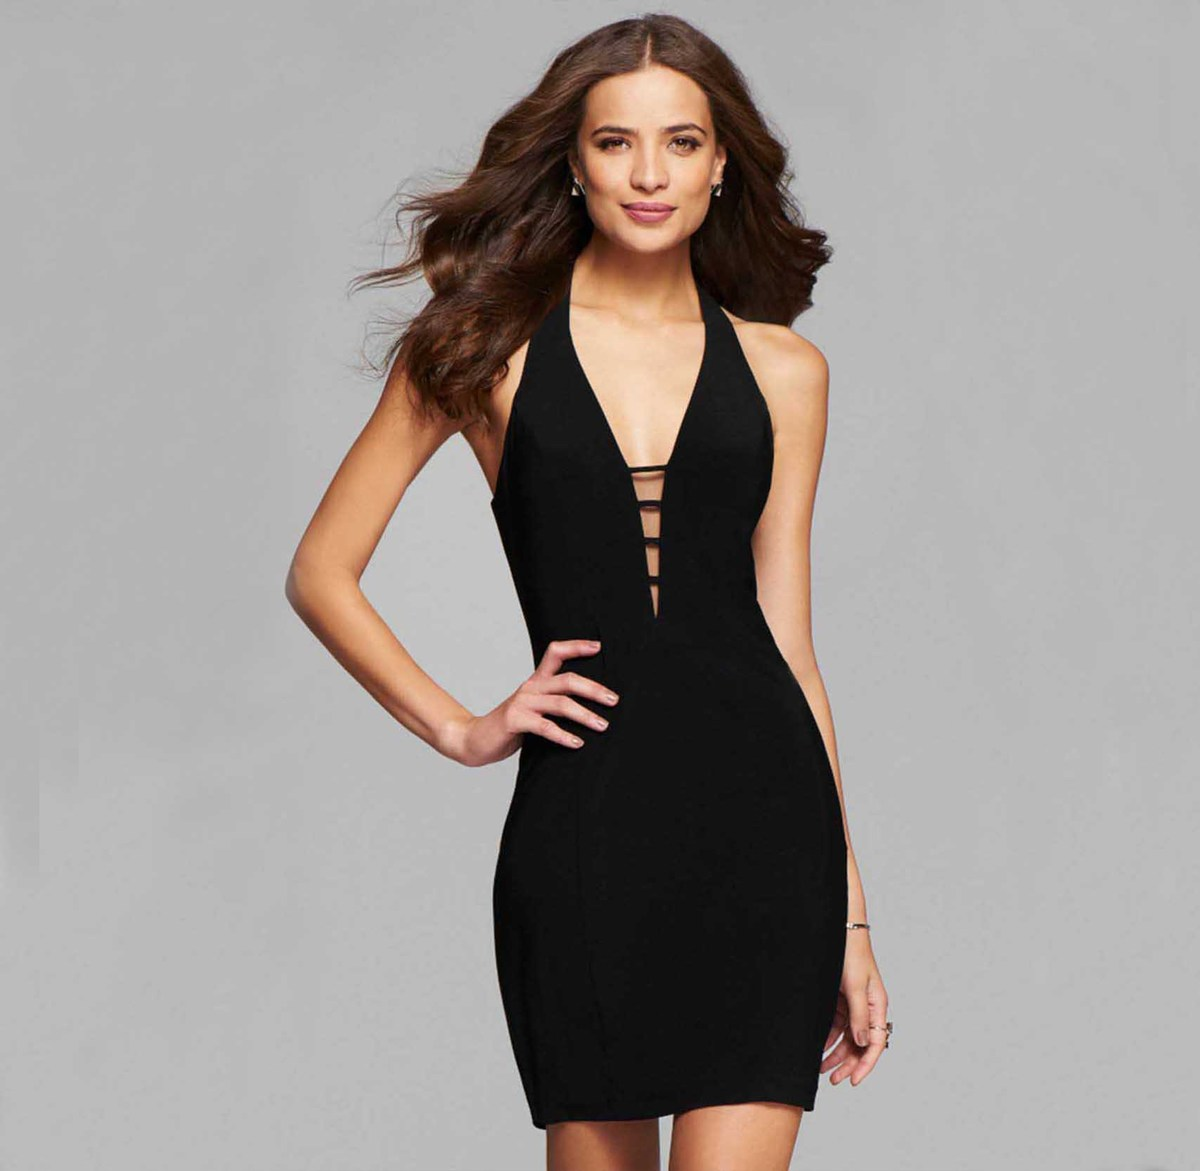 MUXU black bandage suspender dress backless patchwork vestidos sexy fashion kleider summer party bodycon pencil dress jurken in Dresses from Women 39 s Clothing